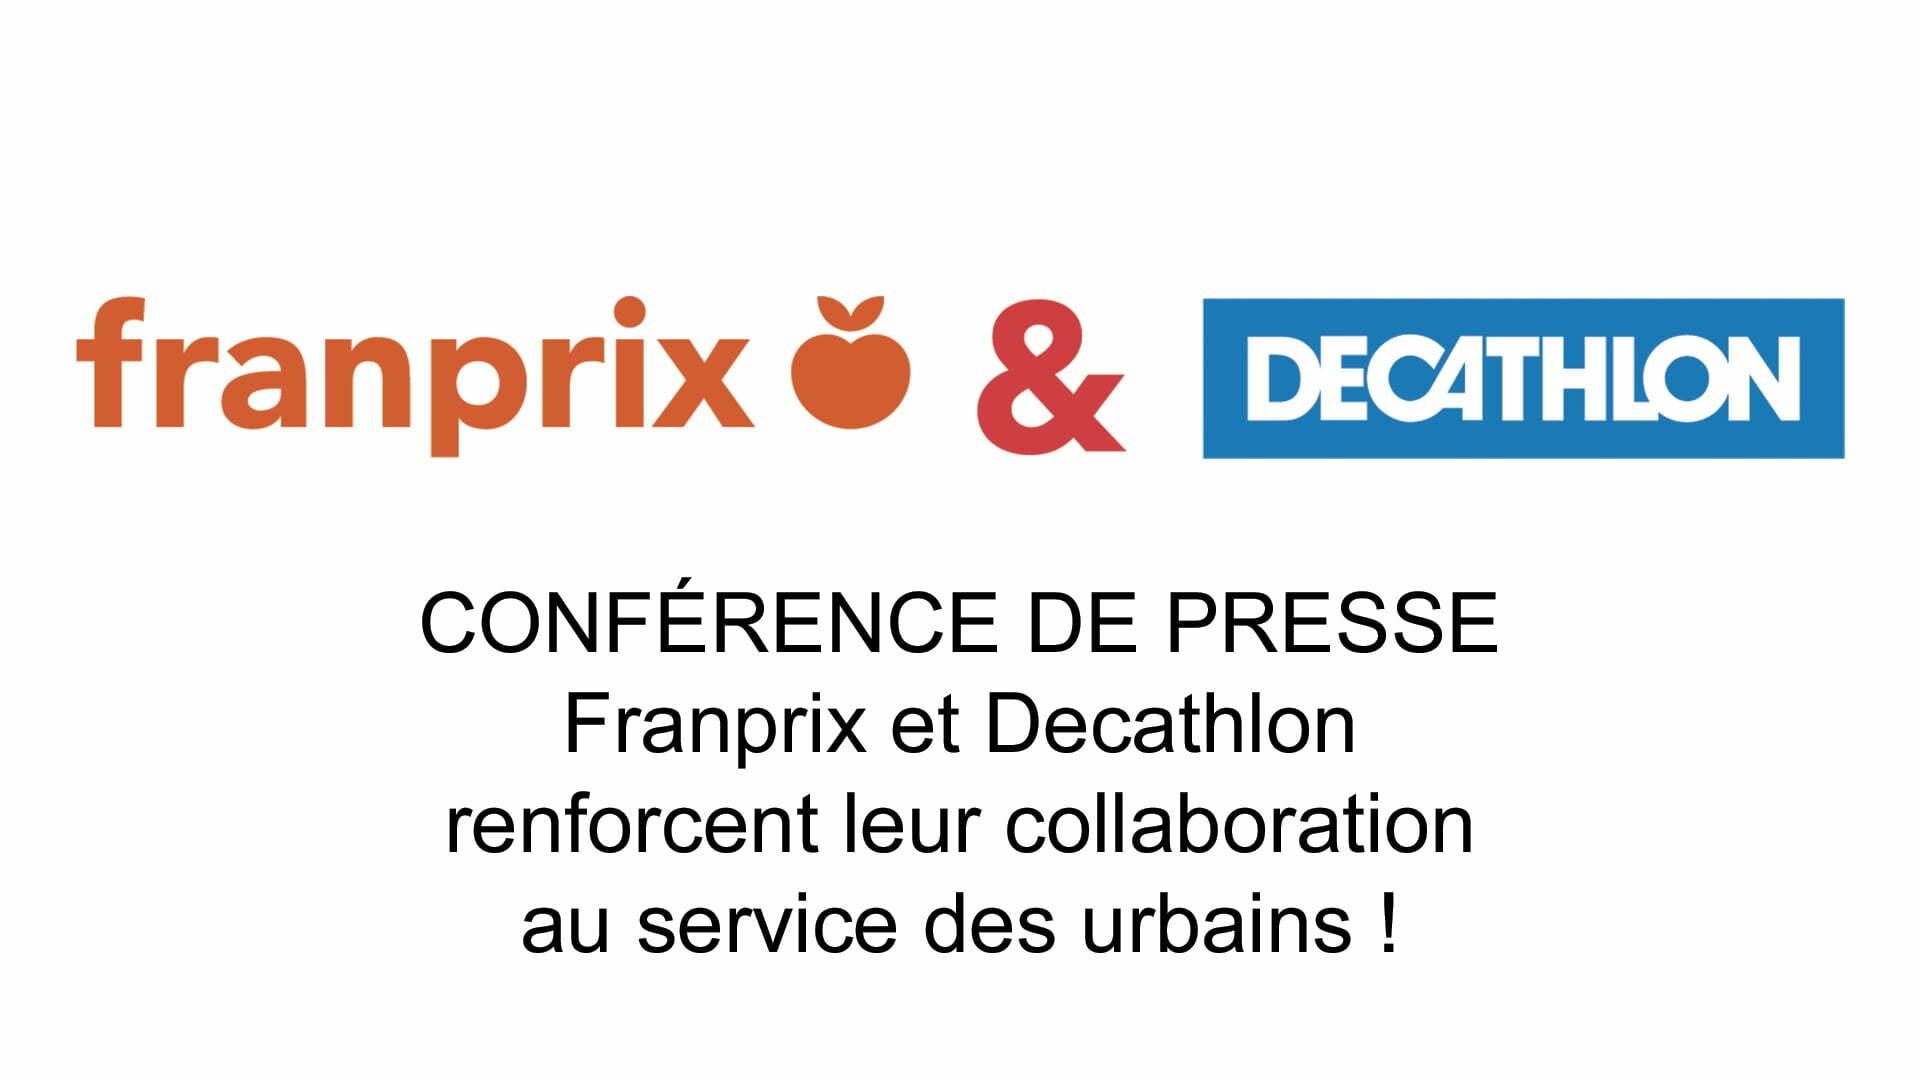 conférence de presse Franprix Decatlon Web conference digitale